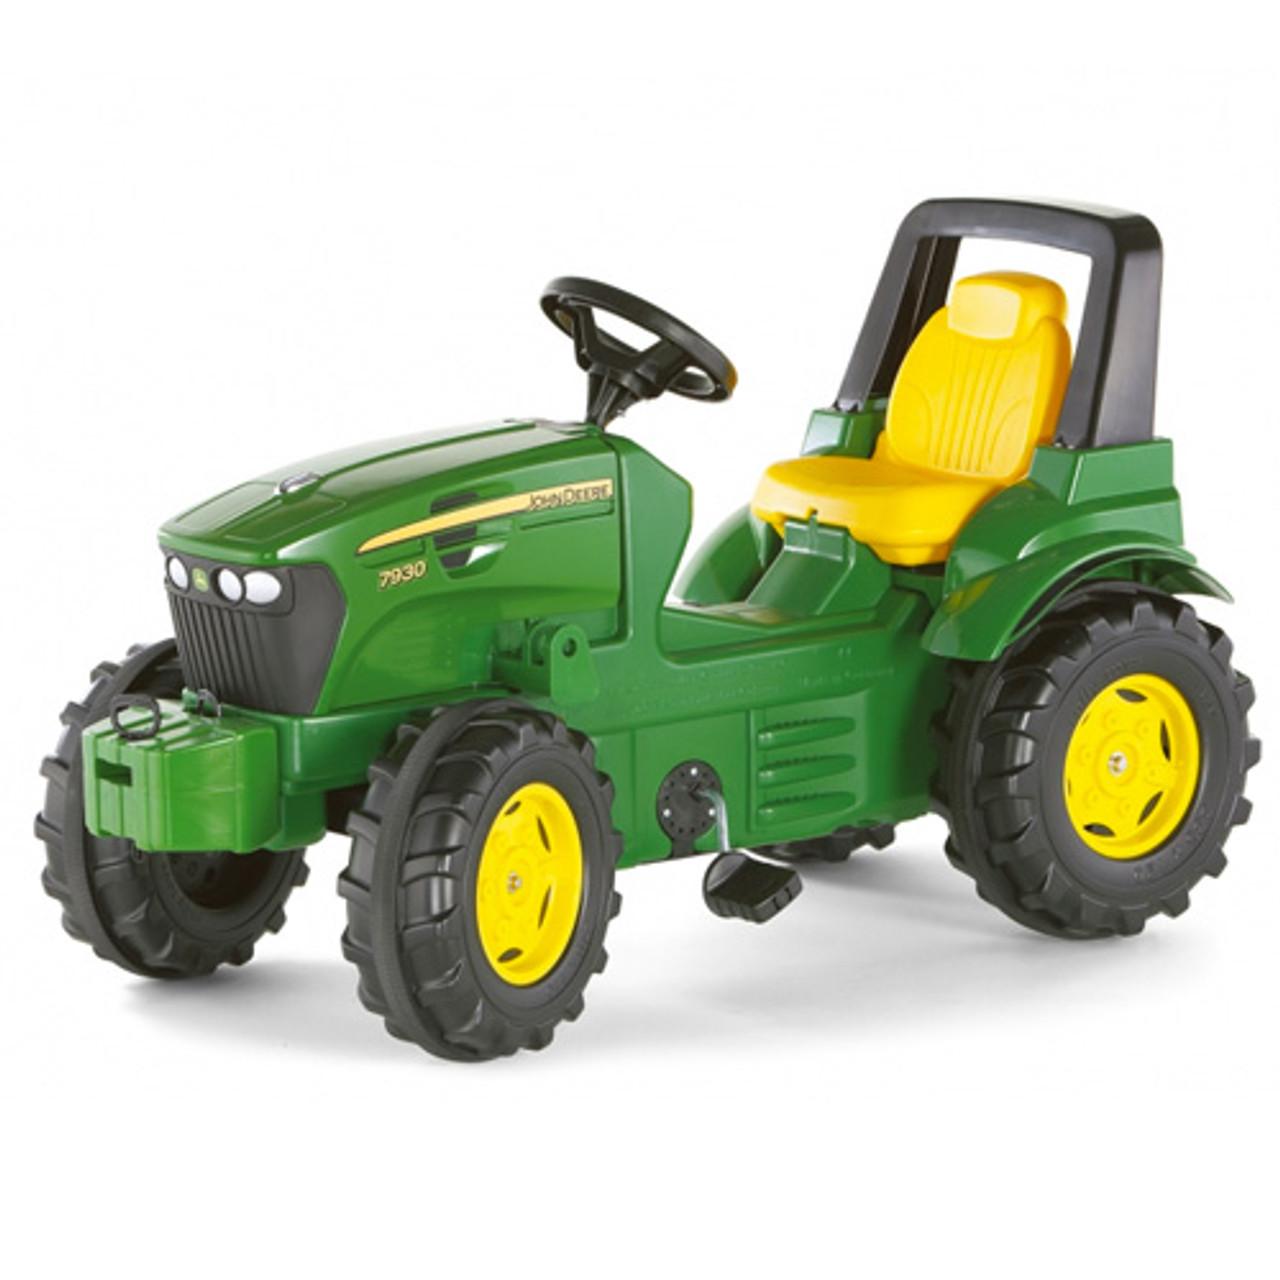 Kids Large John Deere 7930 Green Pedal Tractor Kids Tractors London